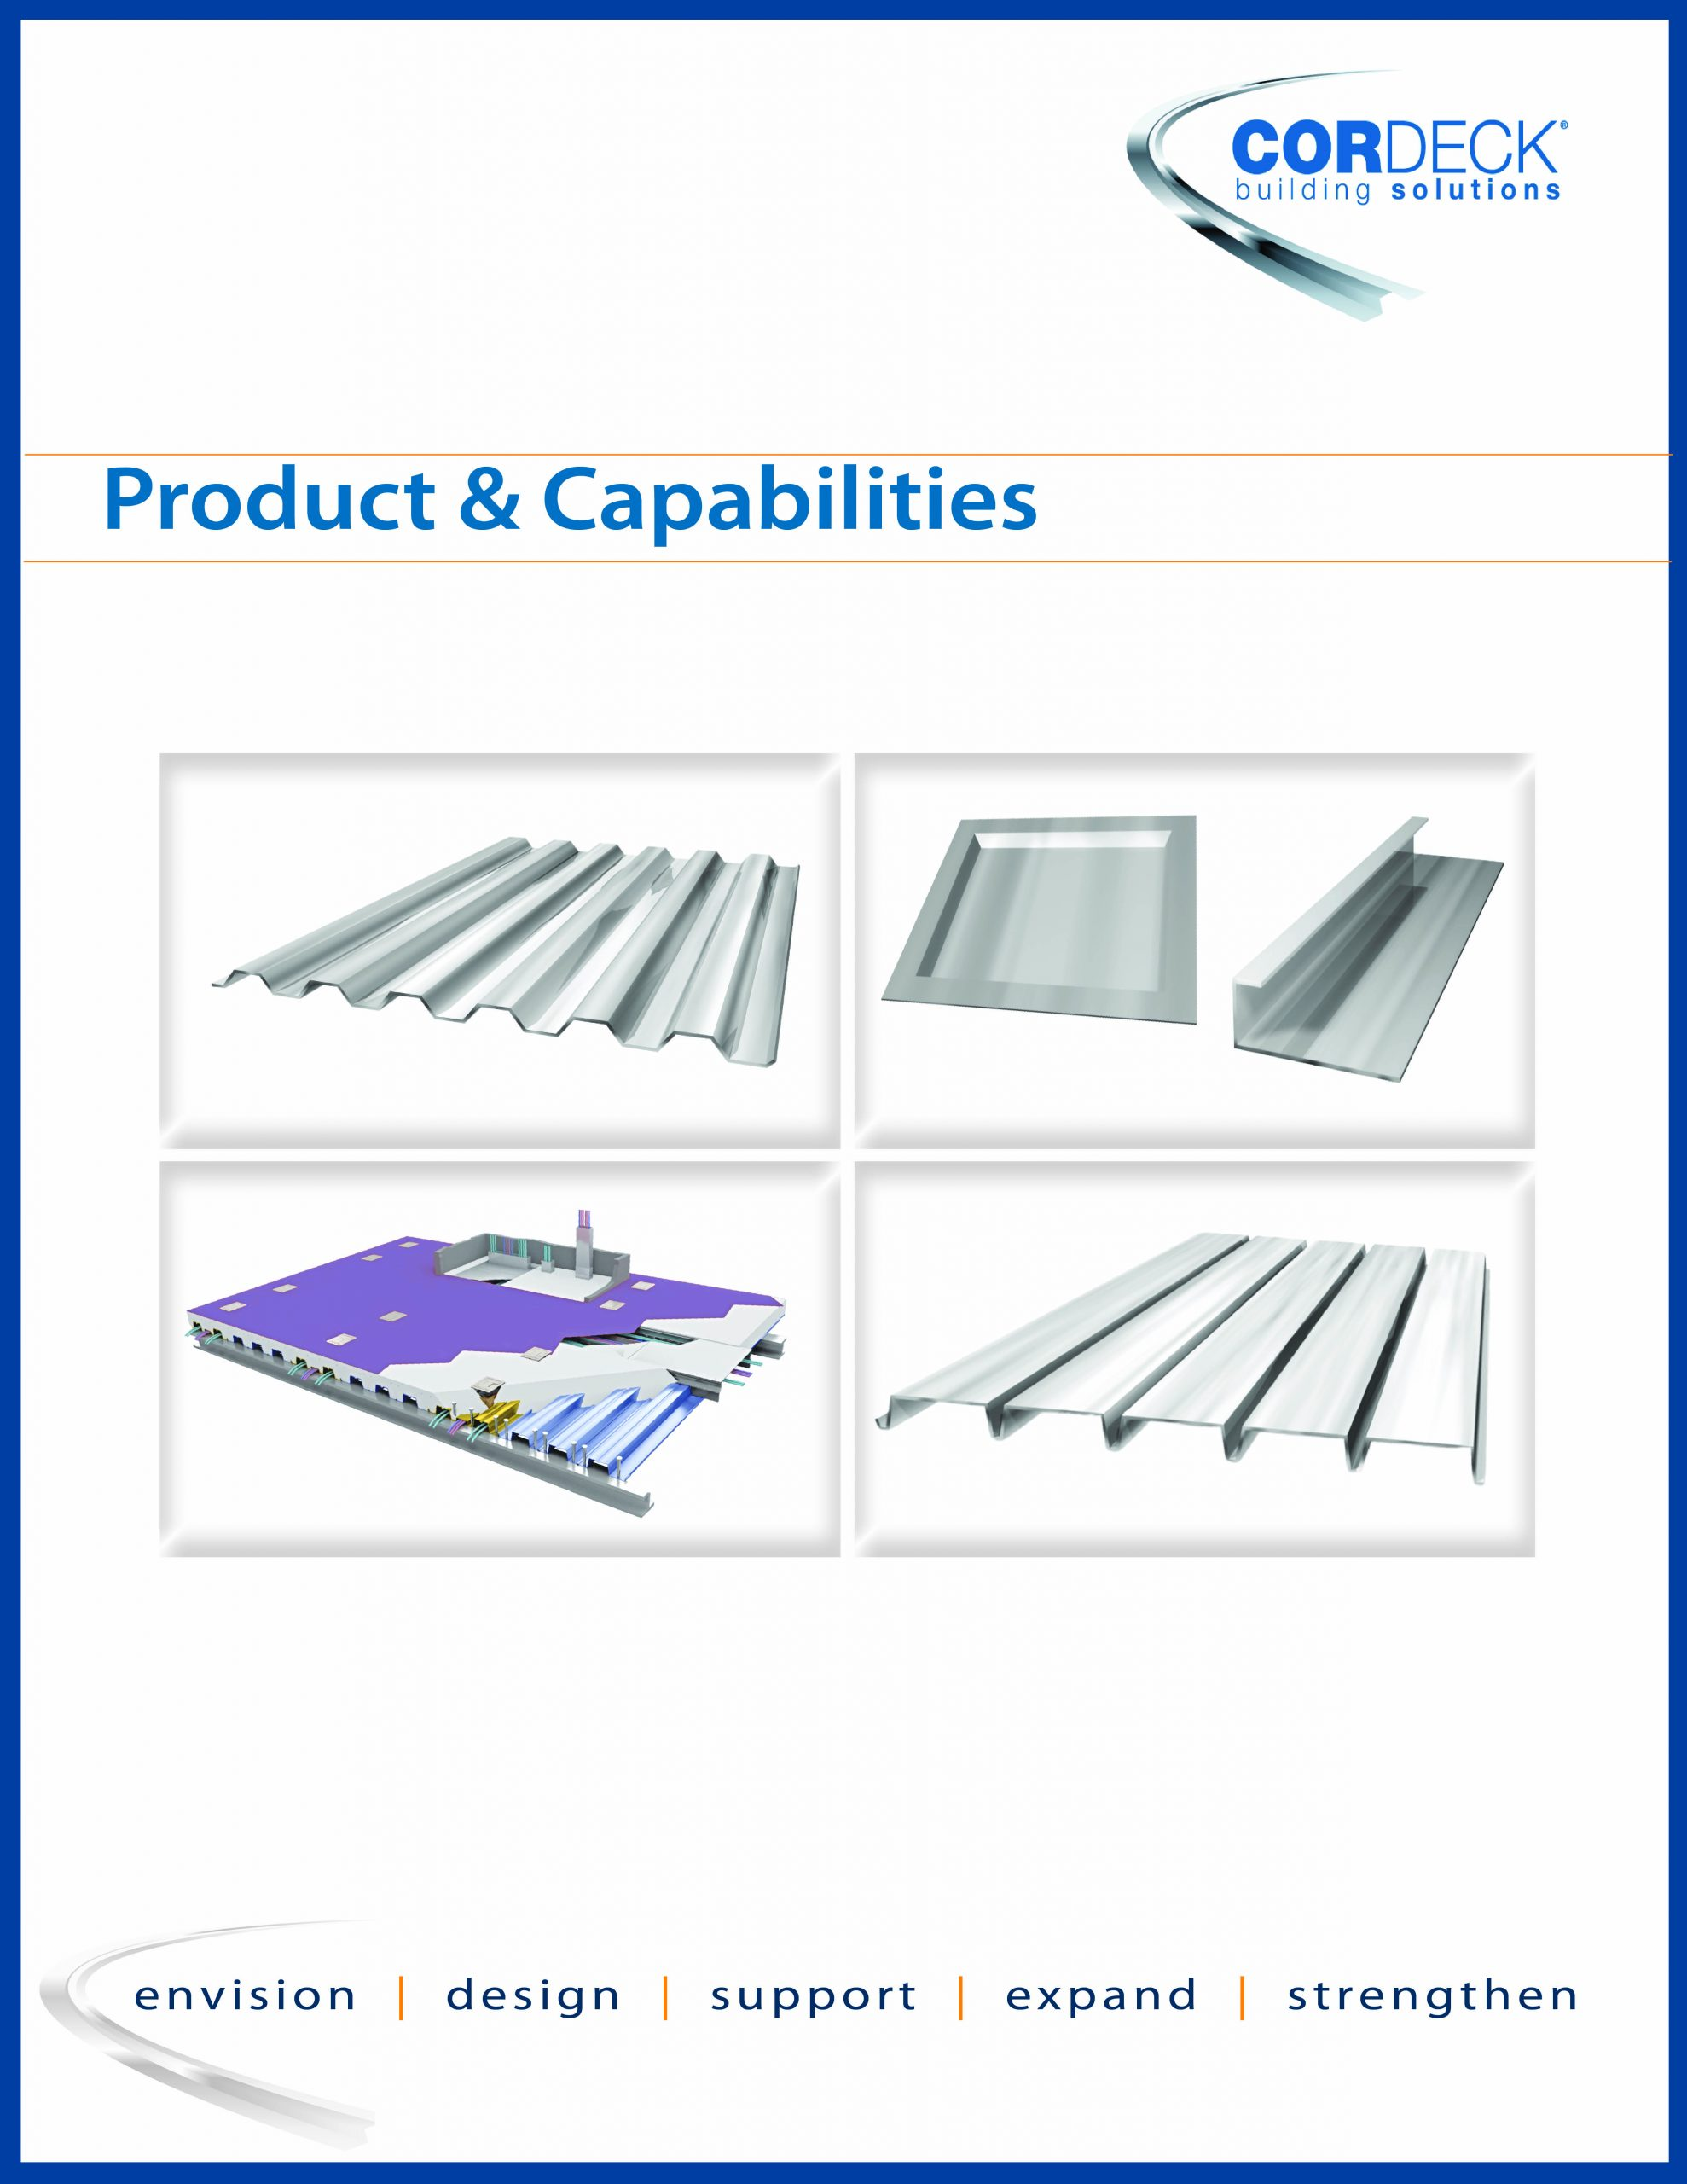 2021 Capabilities Brochure Cover